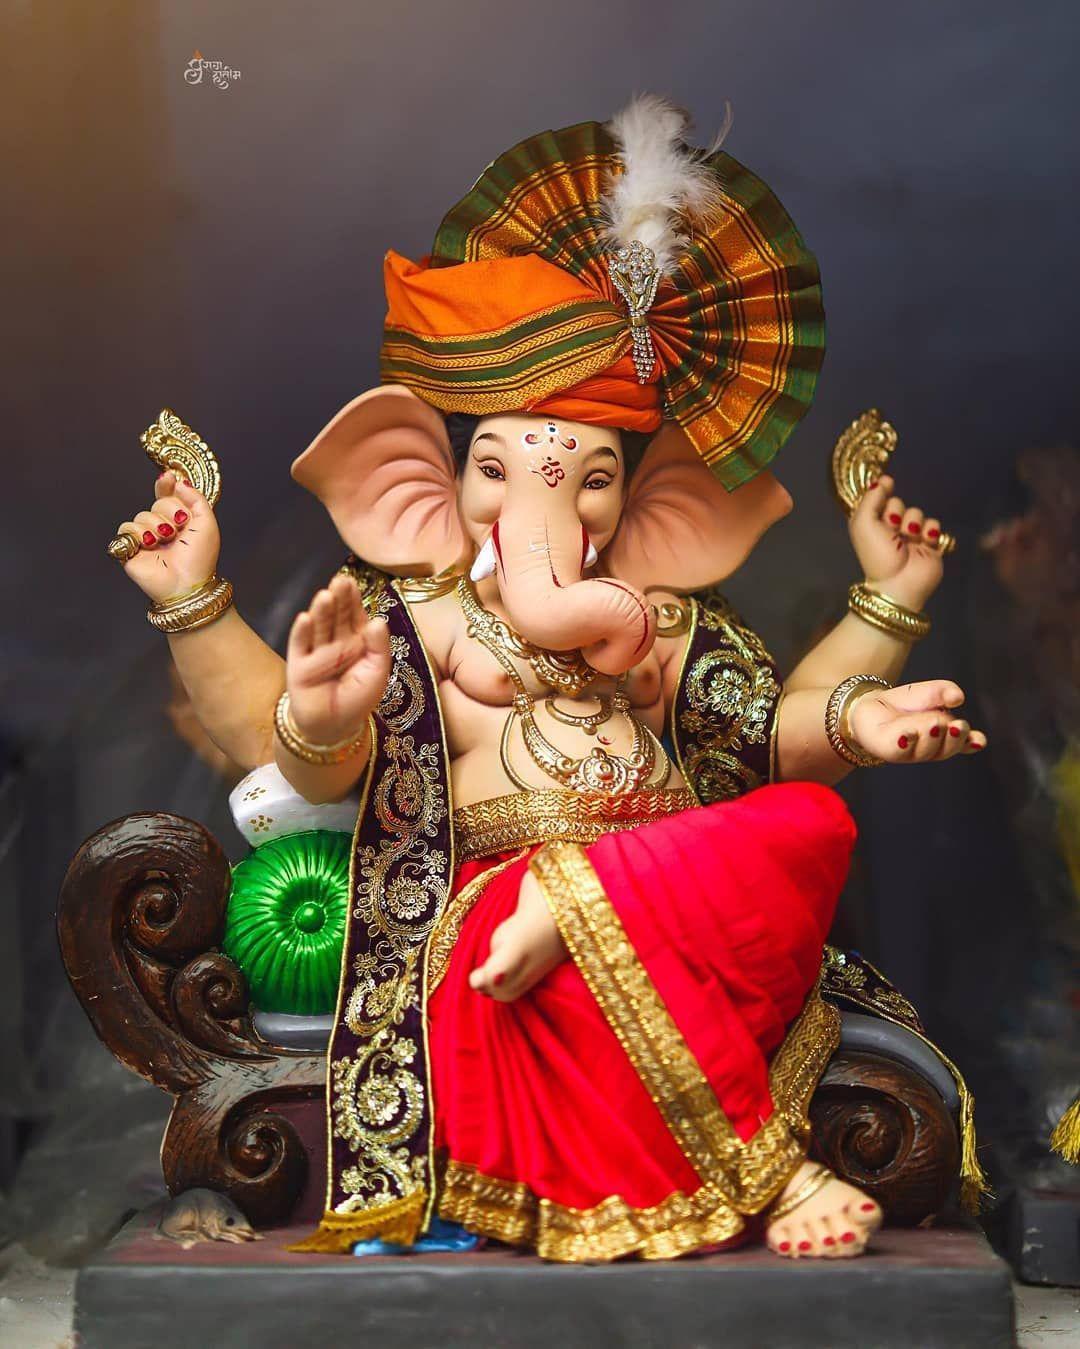 Best 50 Lord Ganesha Images Vedic Sources Ganesha Pictures Happy Ganesh Chaturthi Images Ganesha